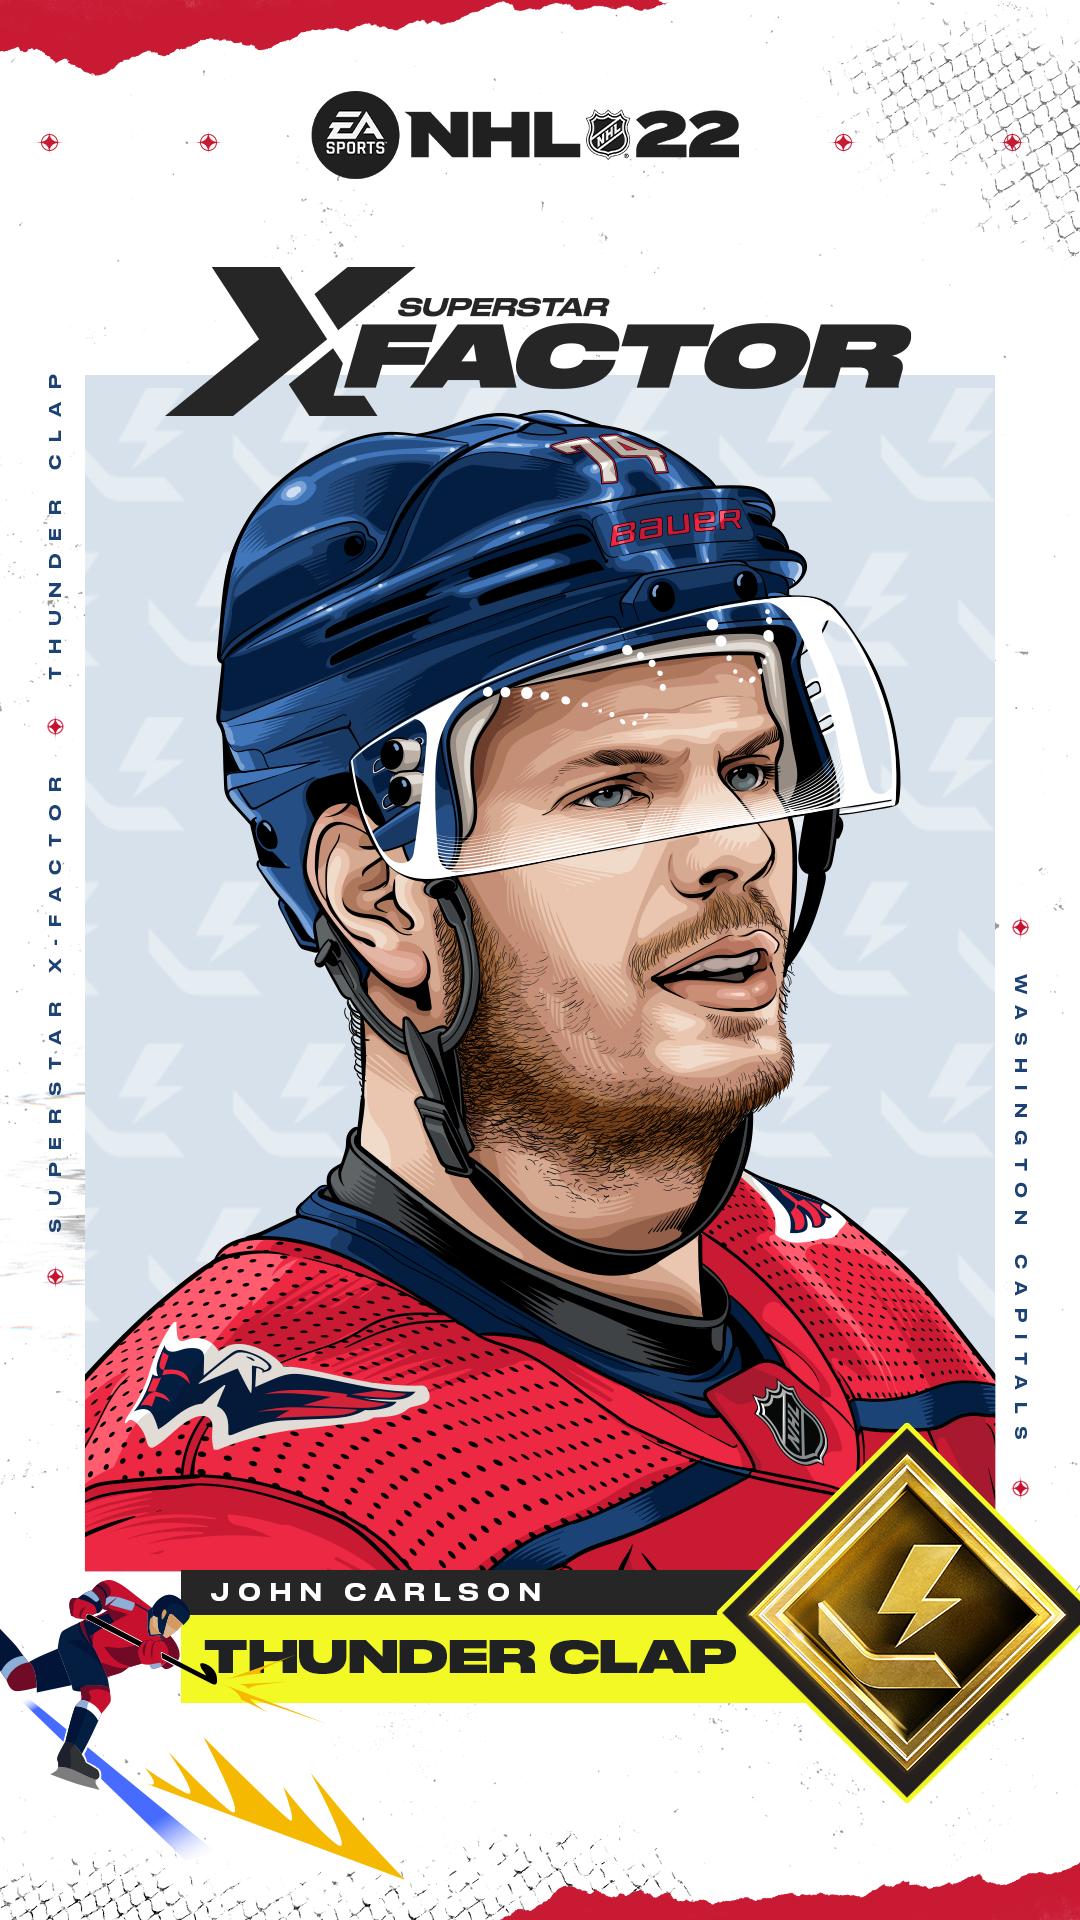 NHL22_XFactor_JohnCarlson__9x16